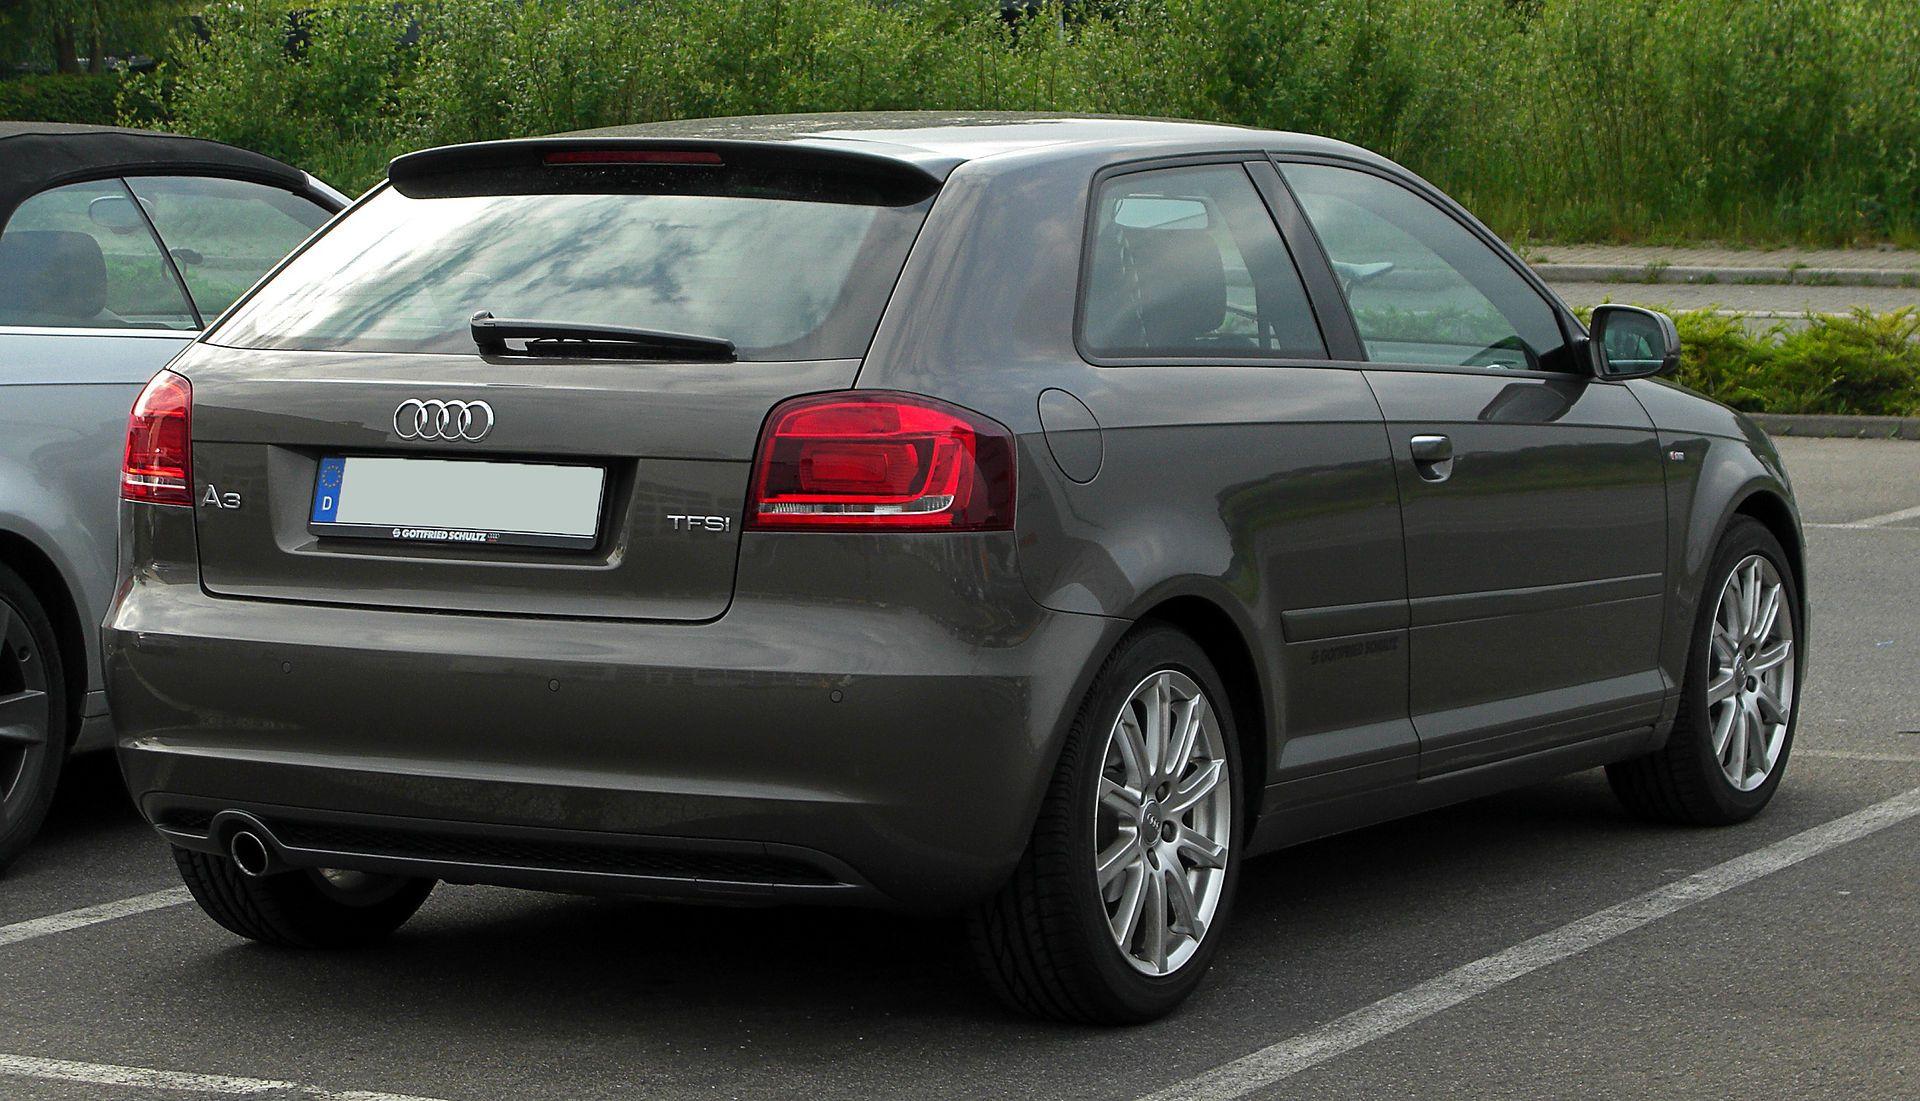 Audi A3 1.2 TFSI Ambition Sline (8P, 3. Facelift